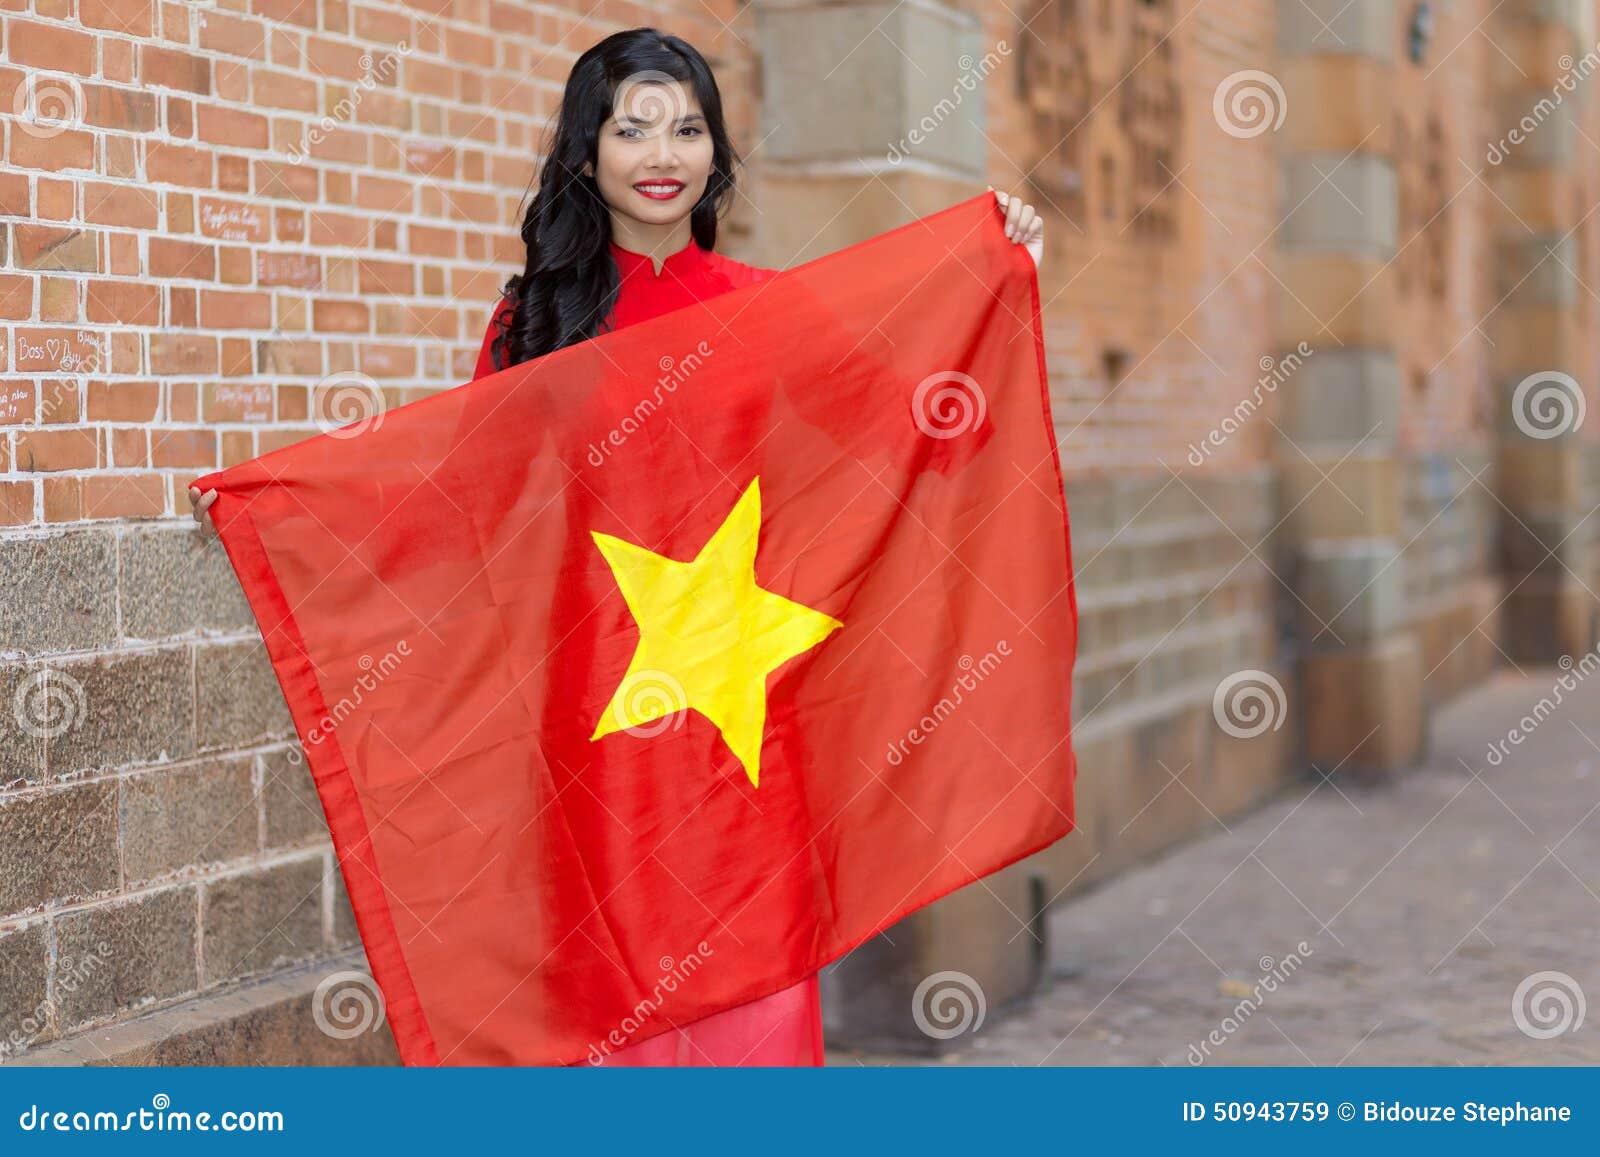 vietnamesische frauen treffen Singen